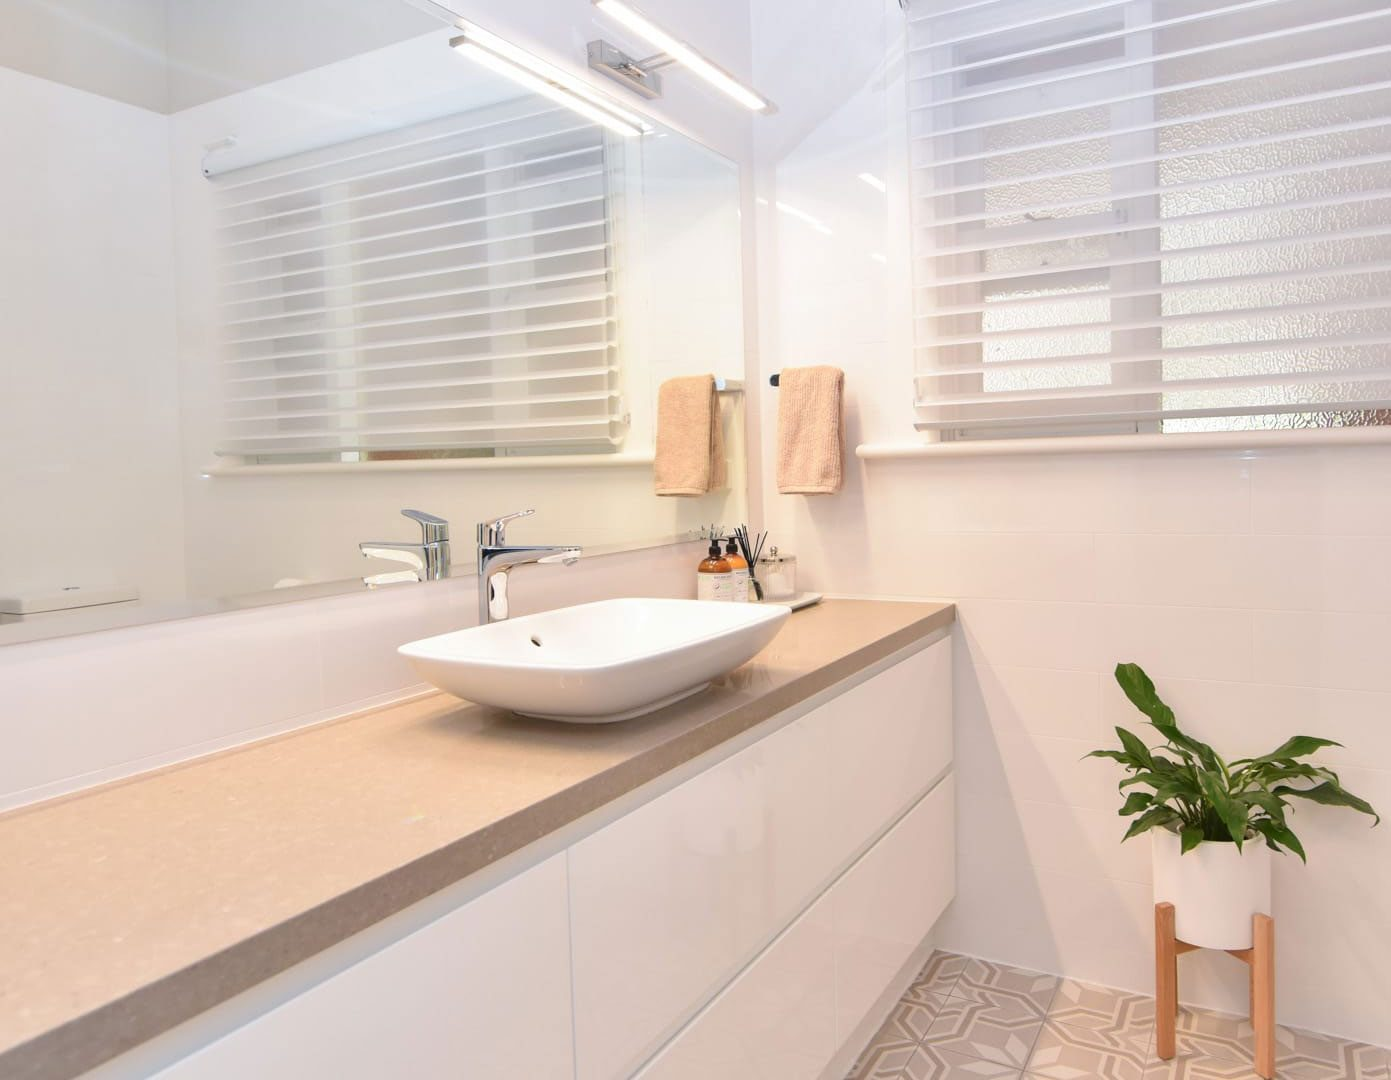 Bathrooms-47.jpg#asset:2309